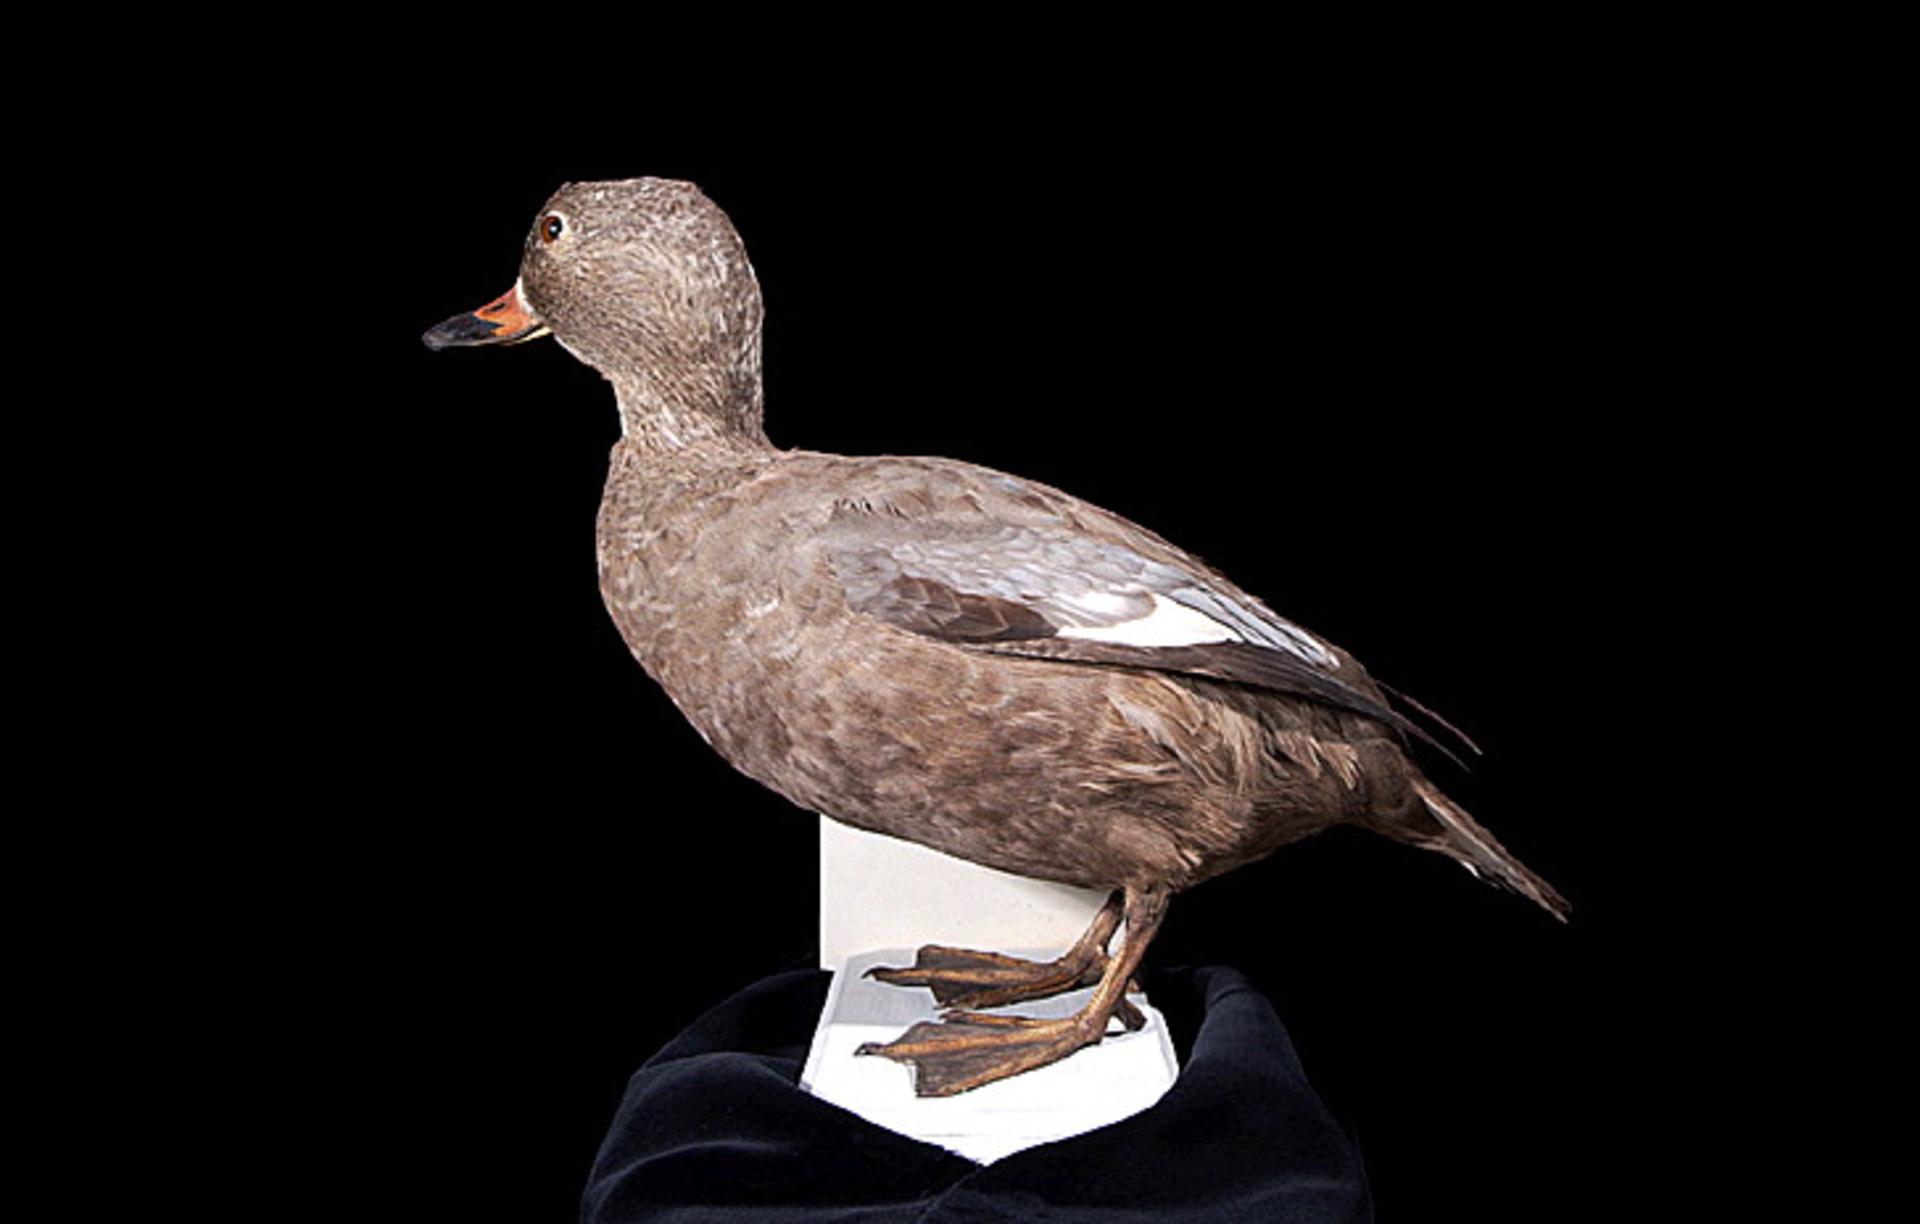 RMNH.AVES.110084 | Camptorhynchus labradorius (Gmelin, 1789)